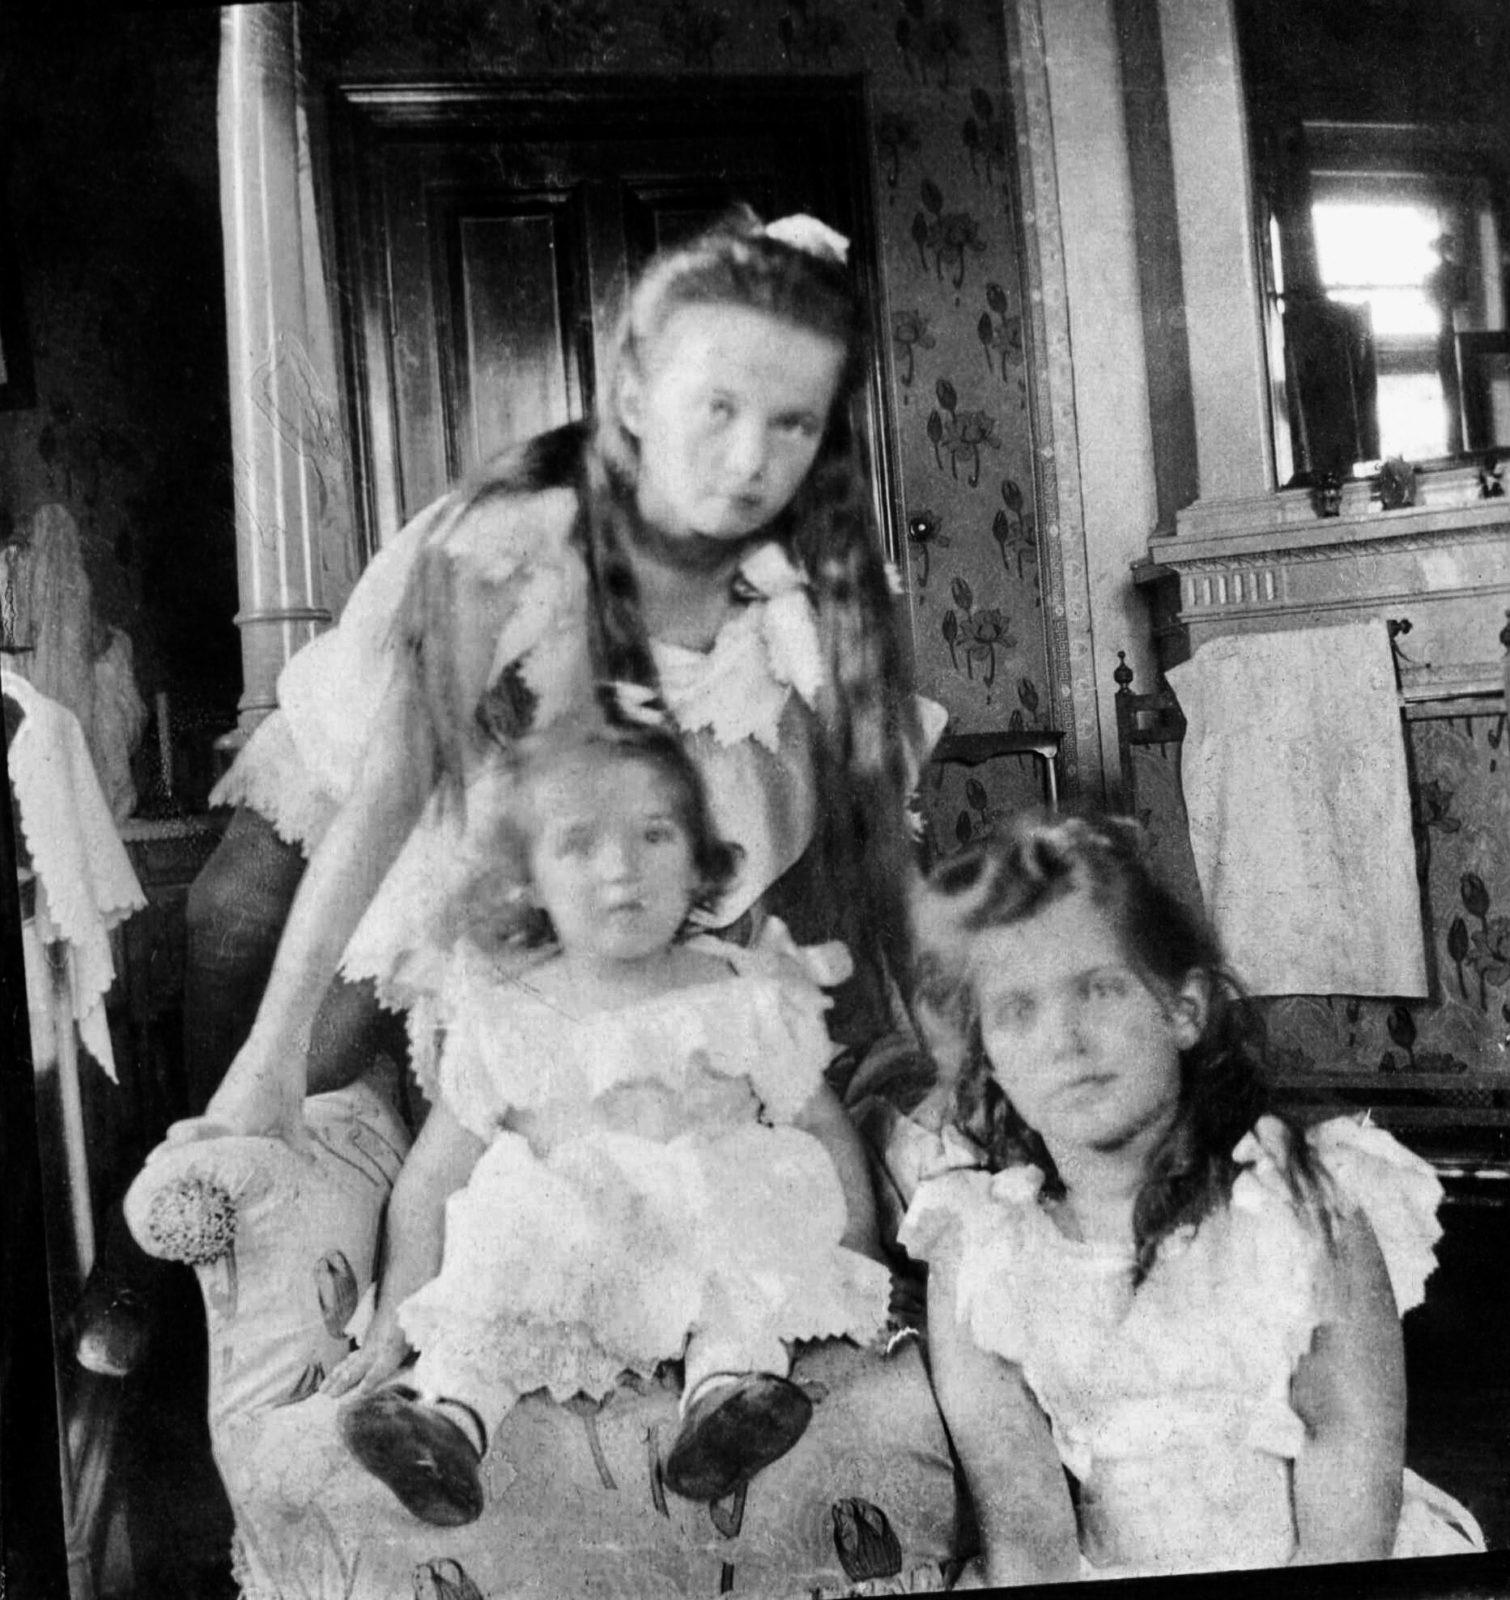 Grand duchesses Olga, Maria & Anastasia